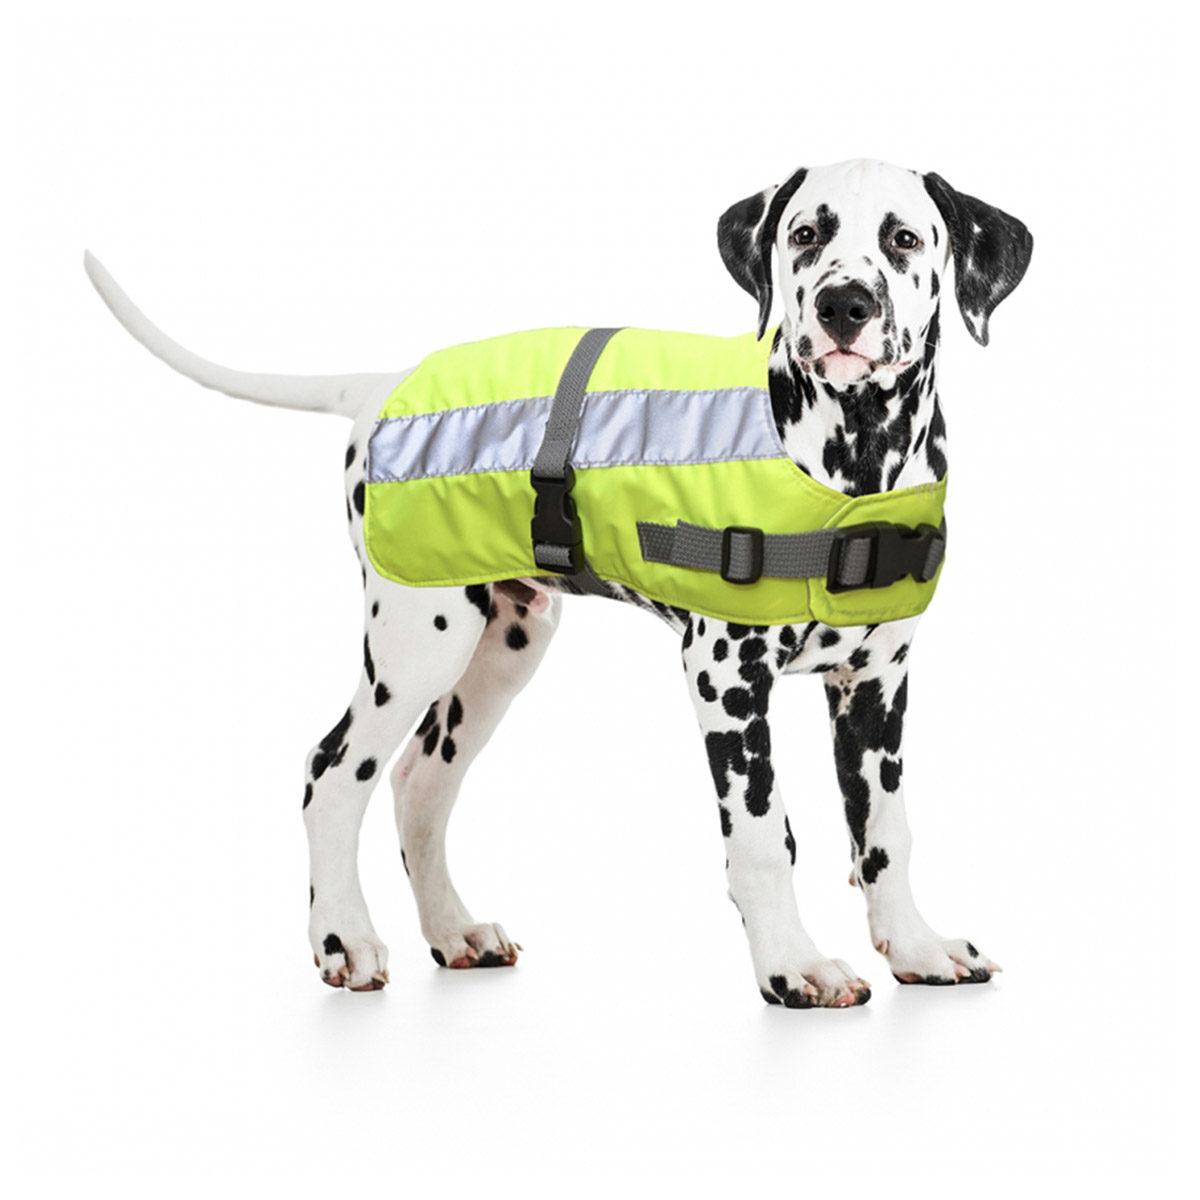 Duvo+ Flectalon Hi Vis Honden Jack Ruglengte 75 cm Geel - in Reflectie & Verlichting